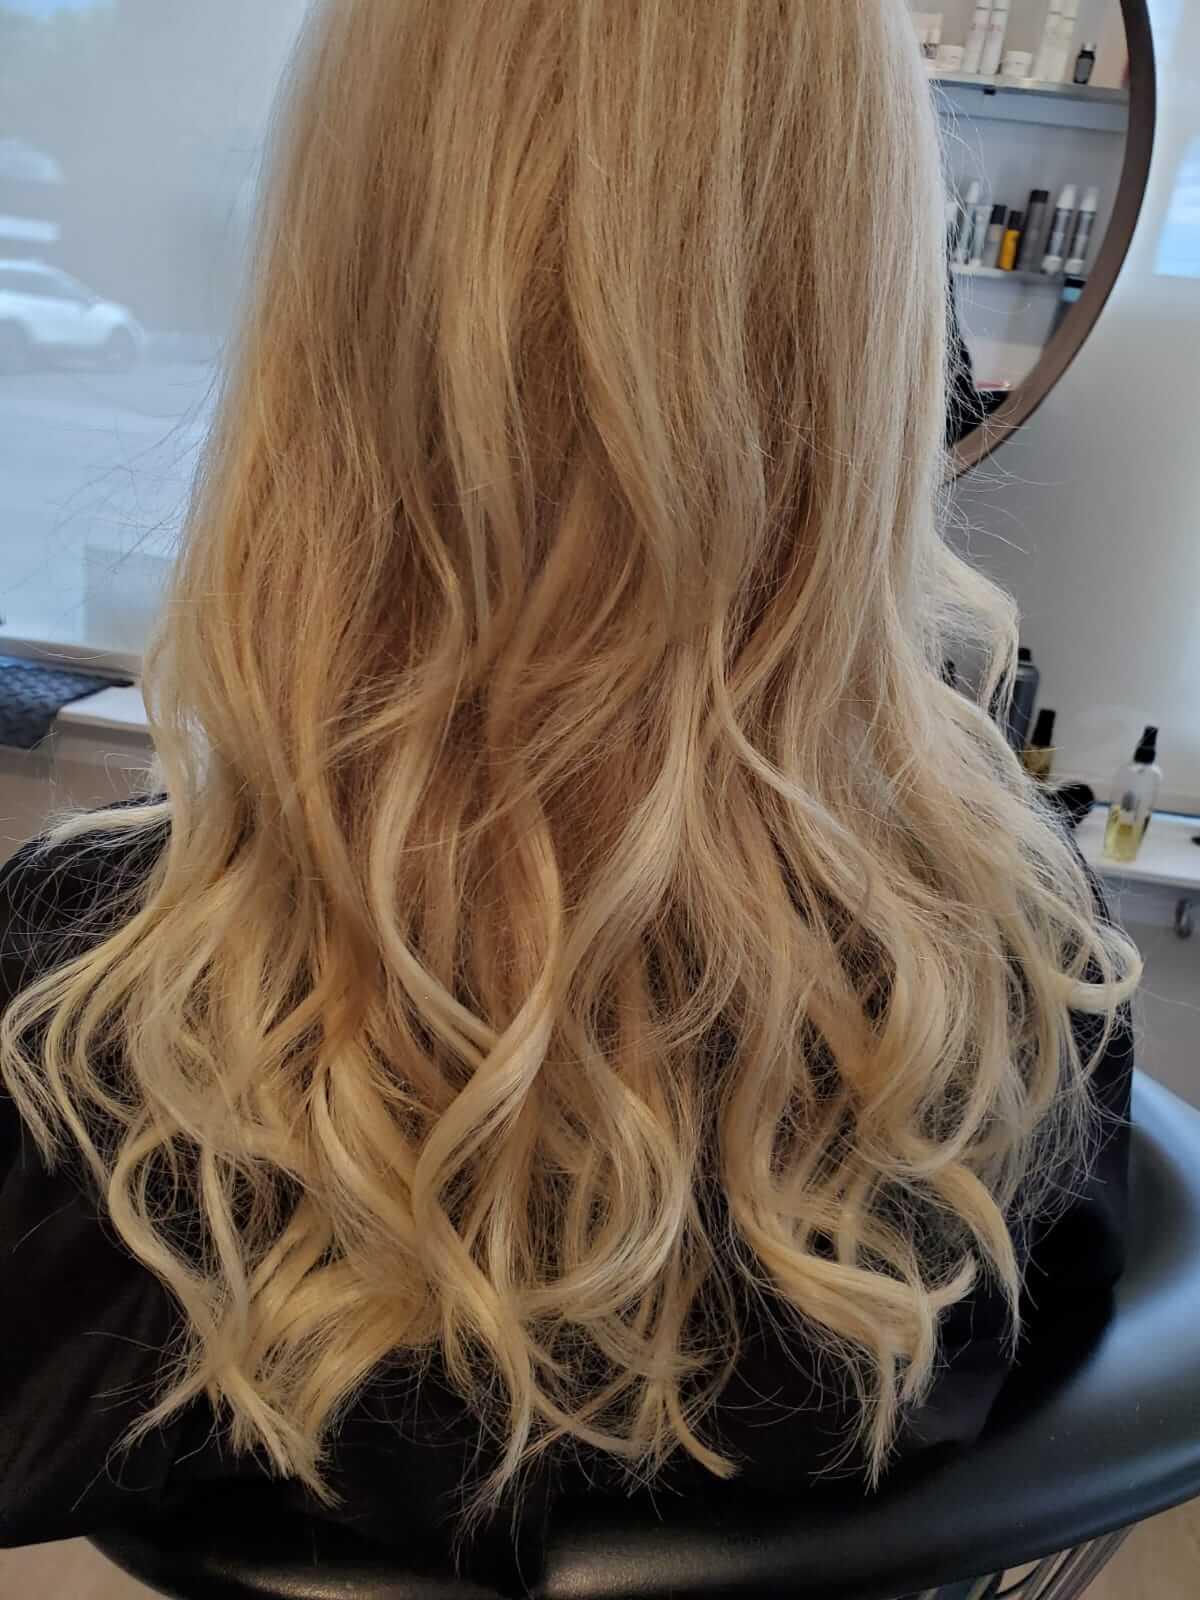 Woman's hair style